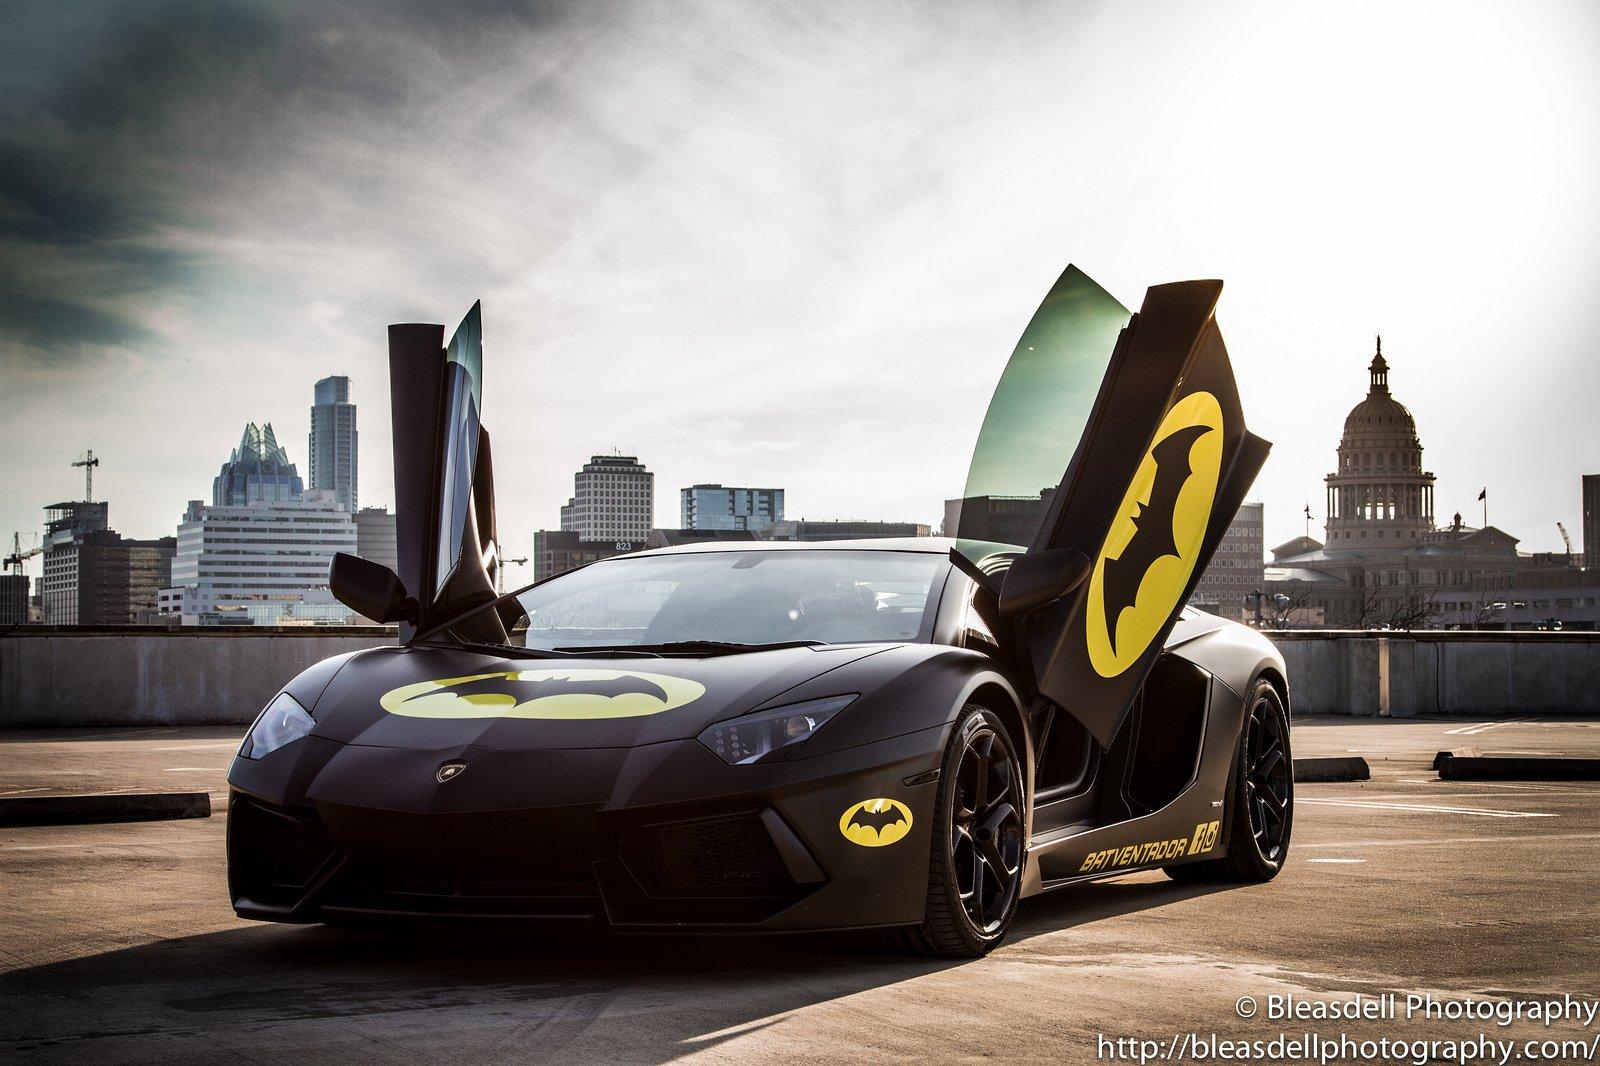 Aventador Lamborghini Lp700 Supercars Tuning Wrapping